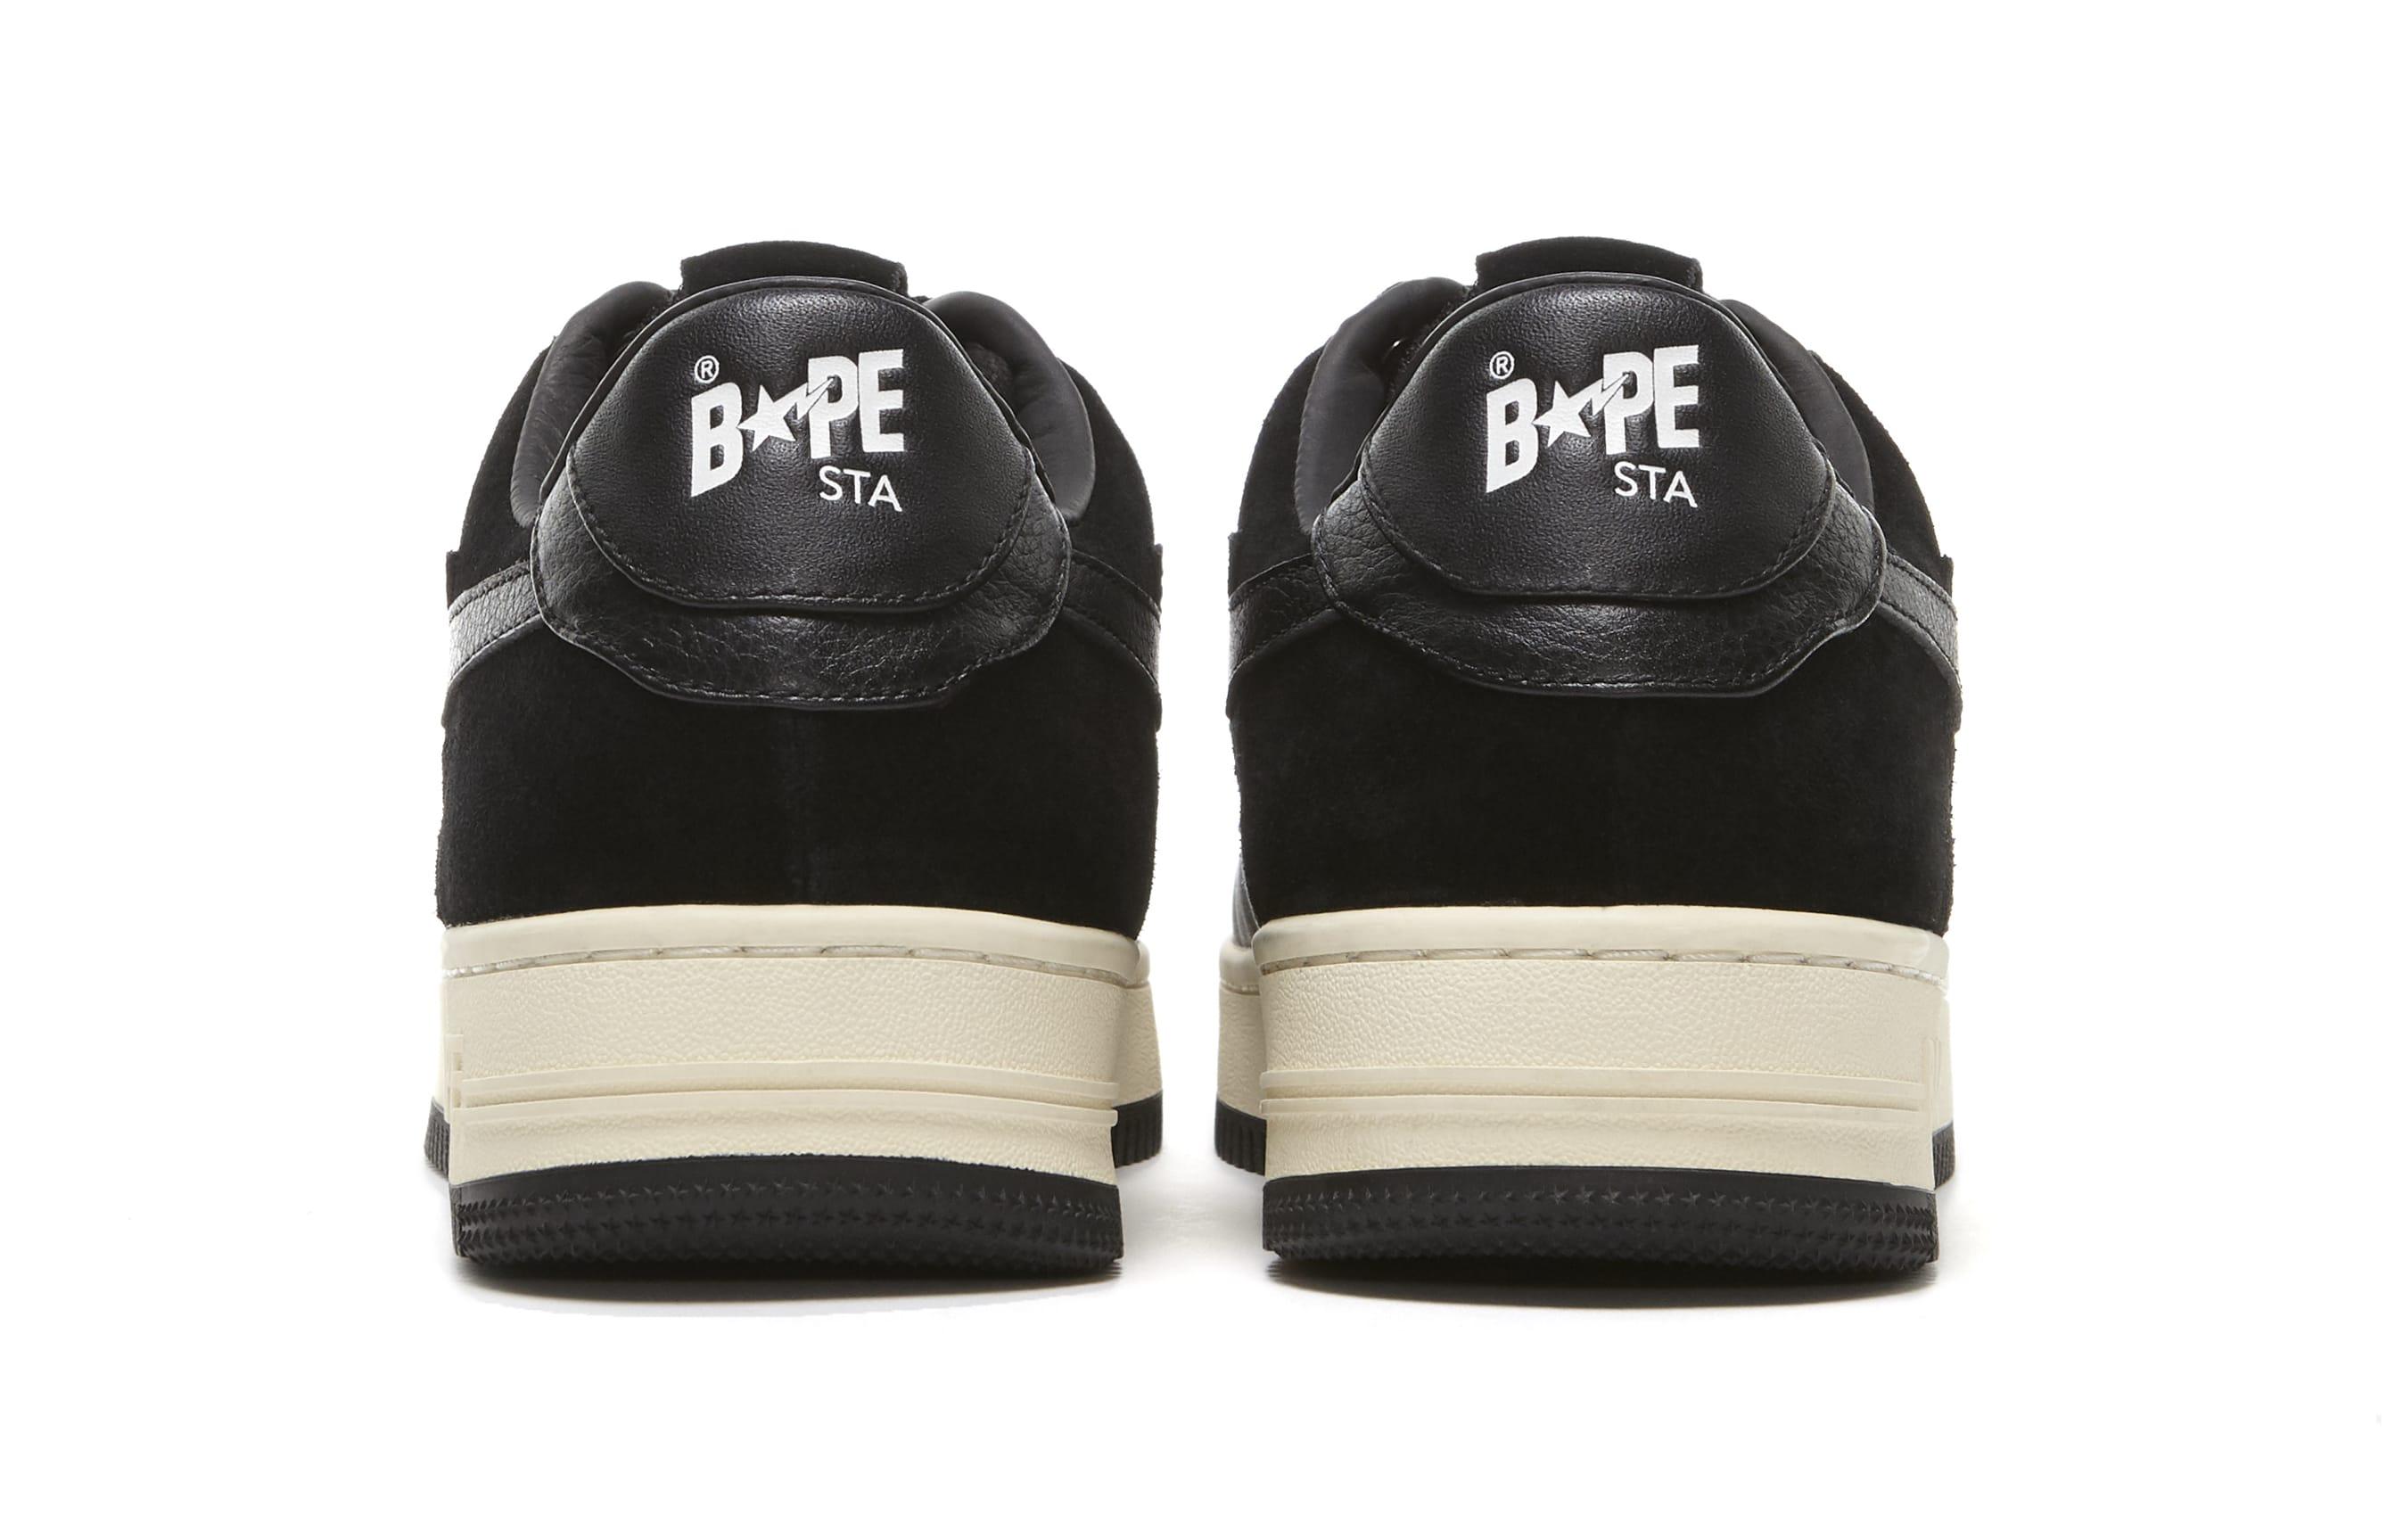 A Bathing Ape Bape Sta 'Black' Spring 2021 Heel